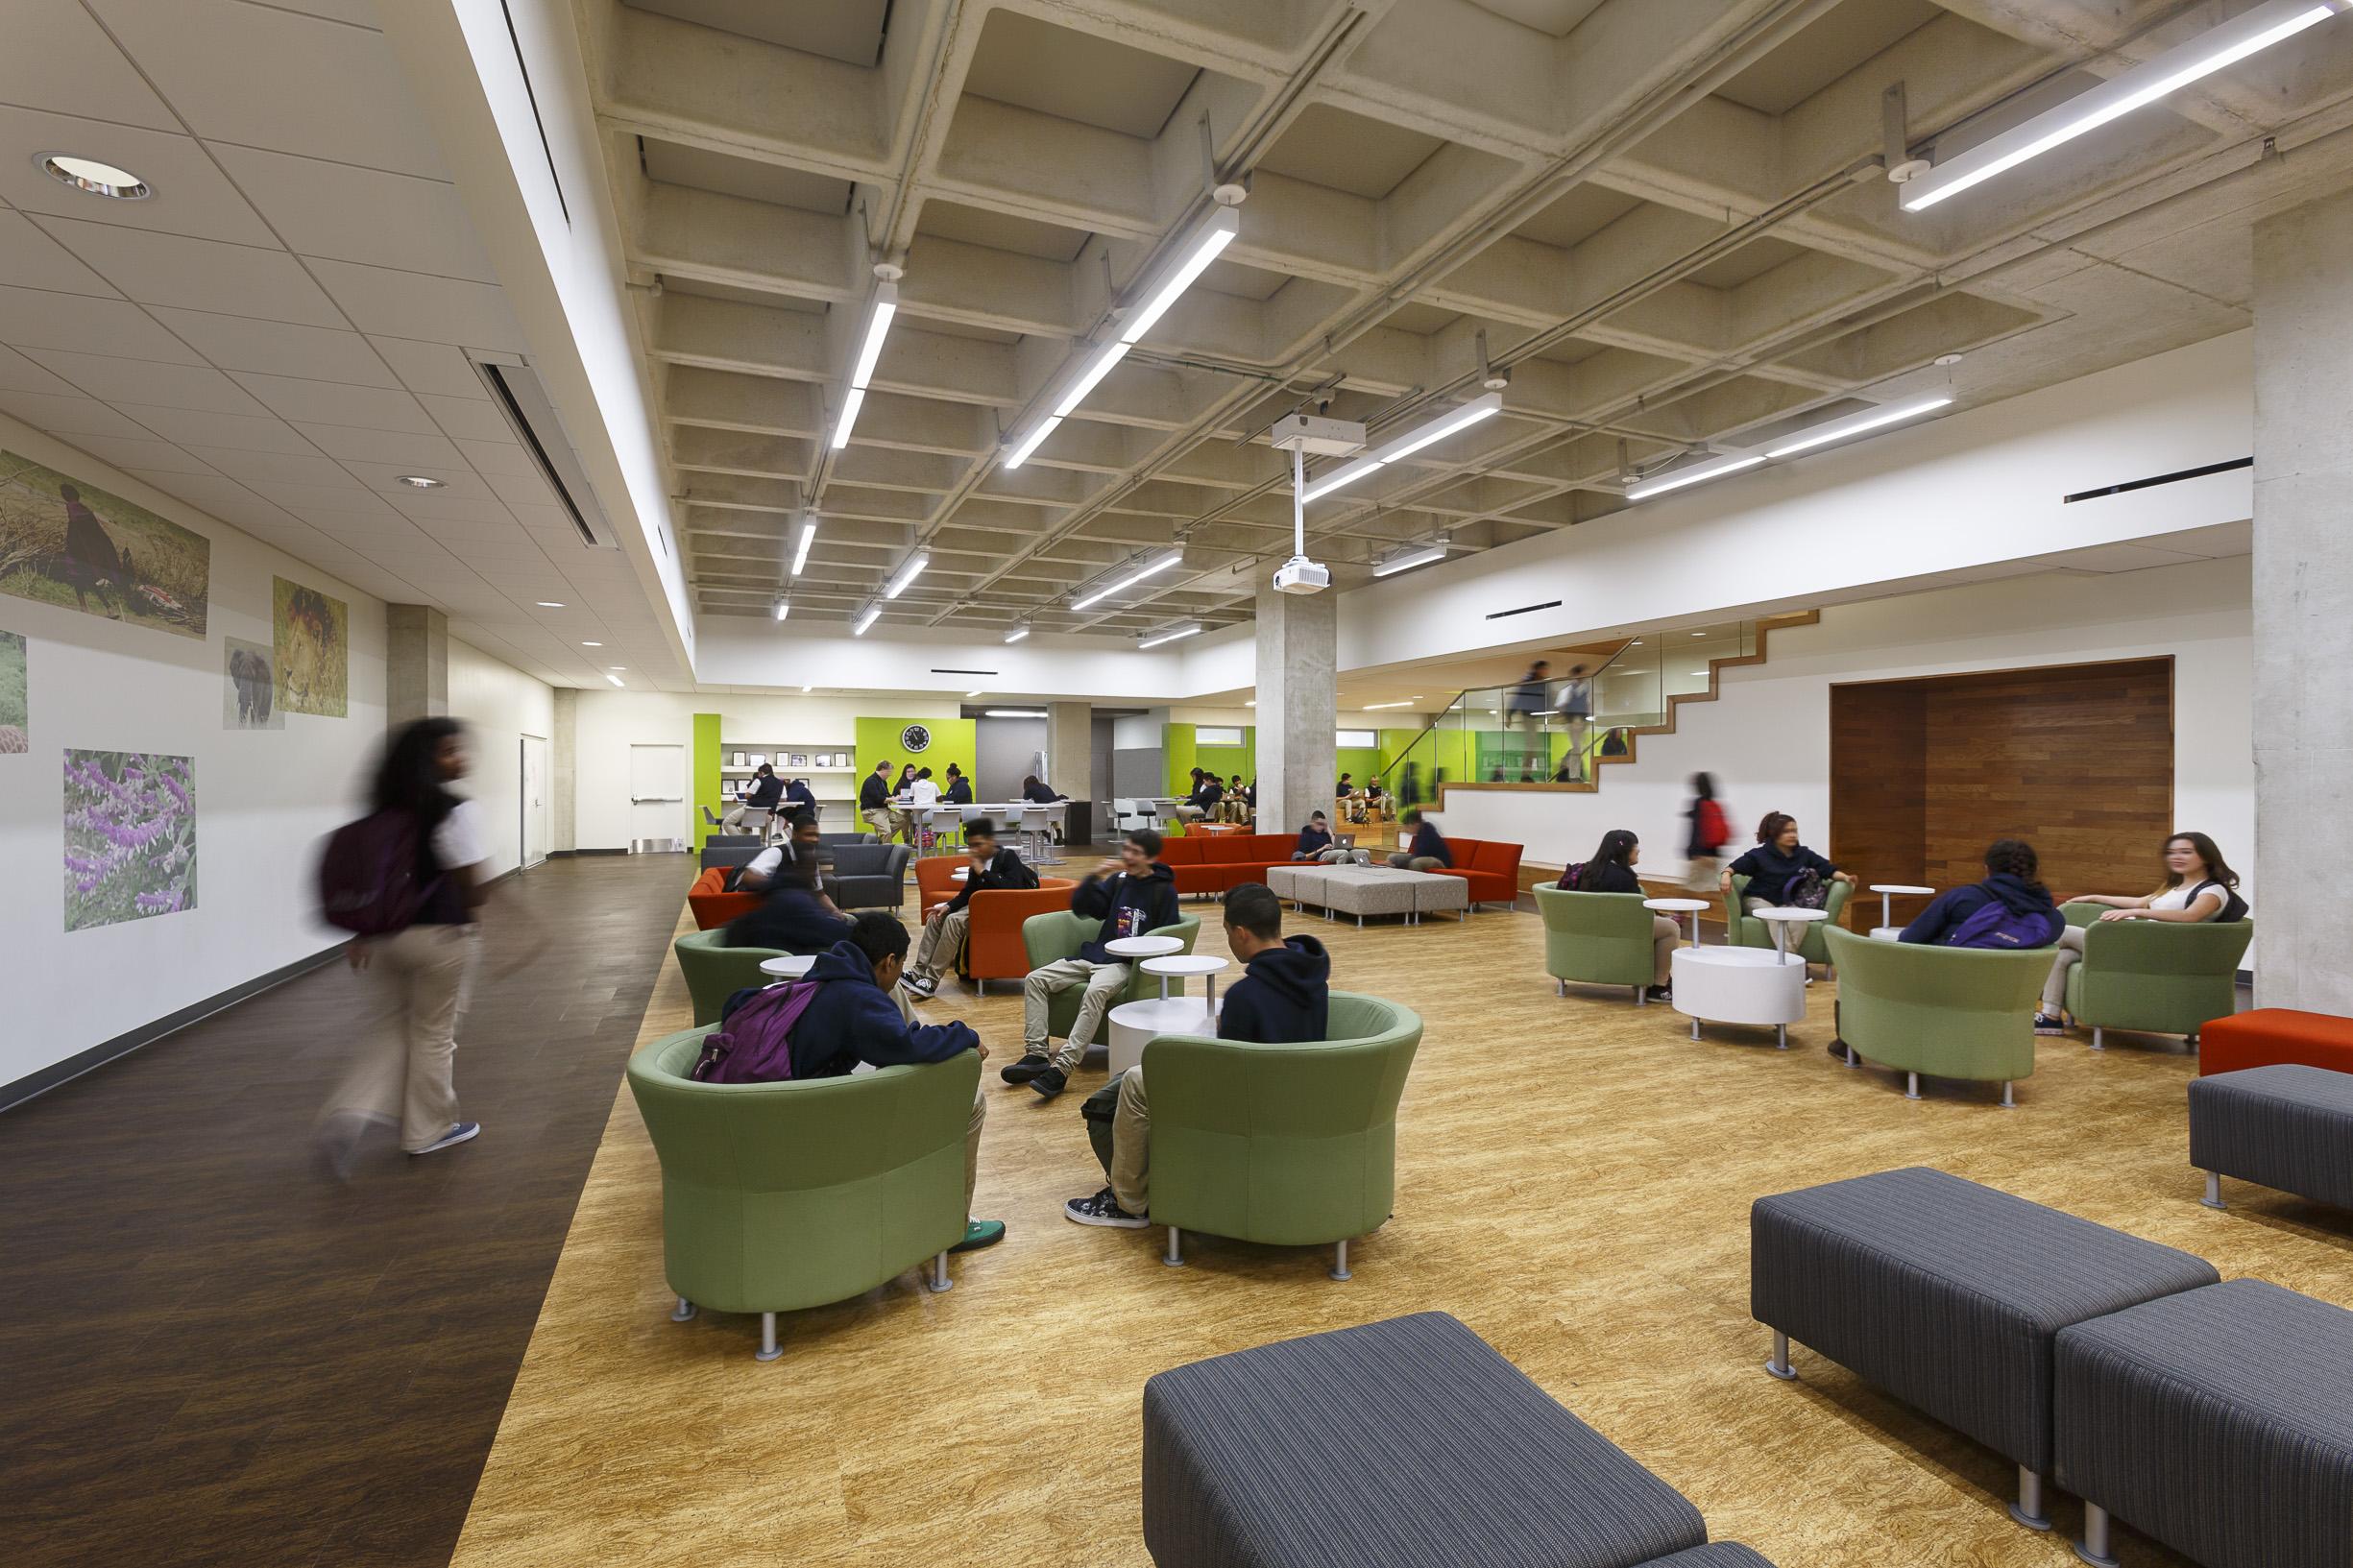 Lpa Inc Receives Honor For Cutting Edge K 12 School Design